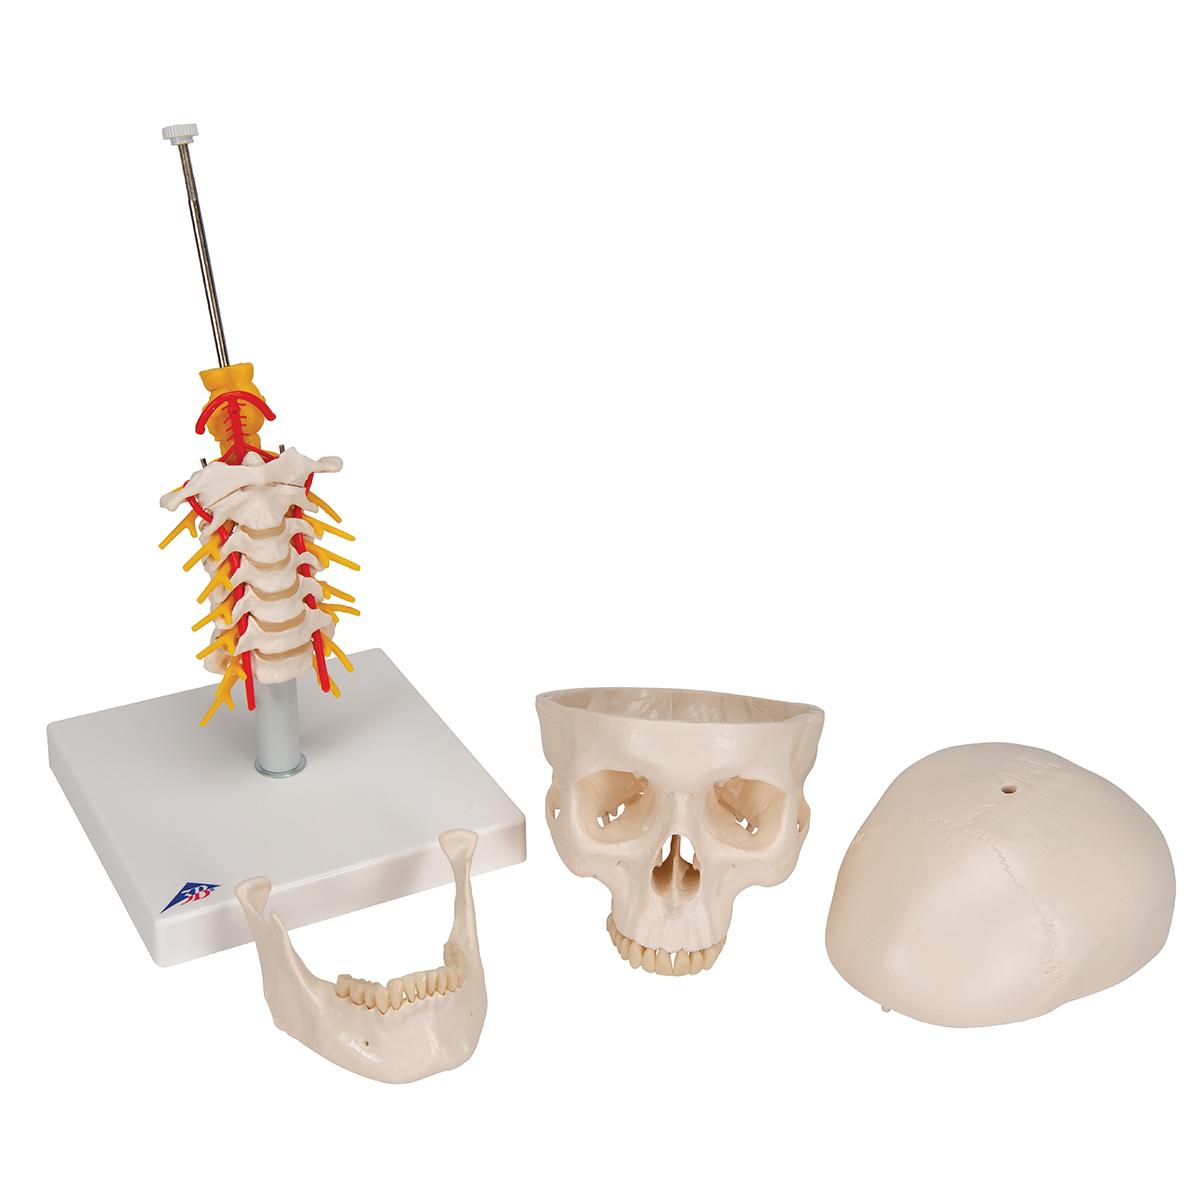 Klassik-Schädel auf Halswirbelsäule, 4-teilig - 1020160 - A20/1 ...